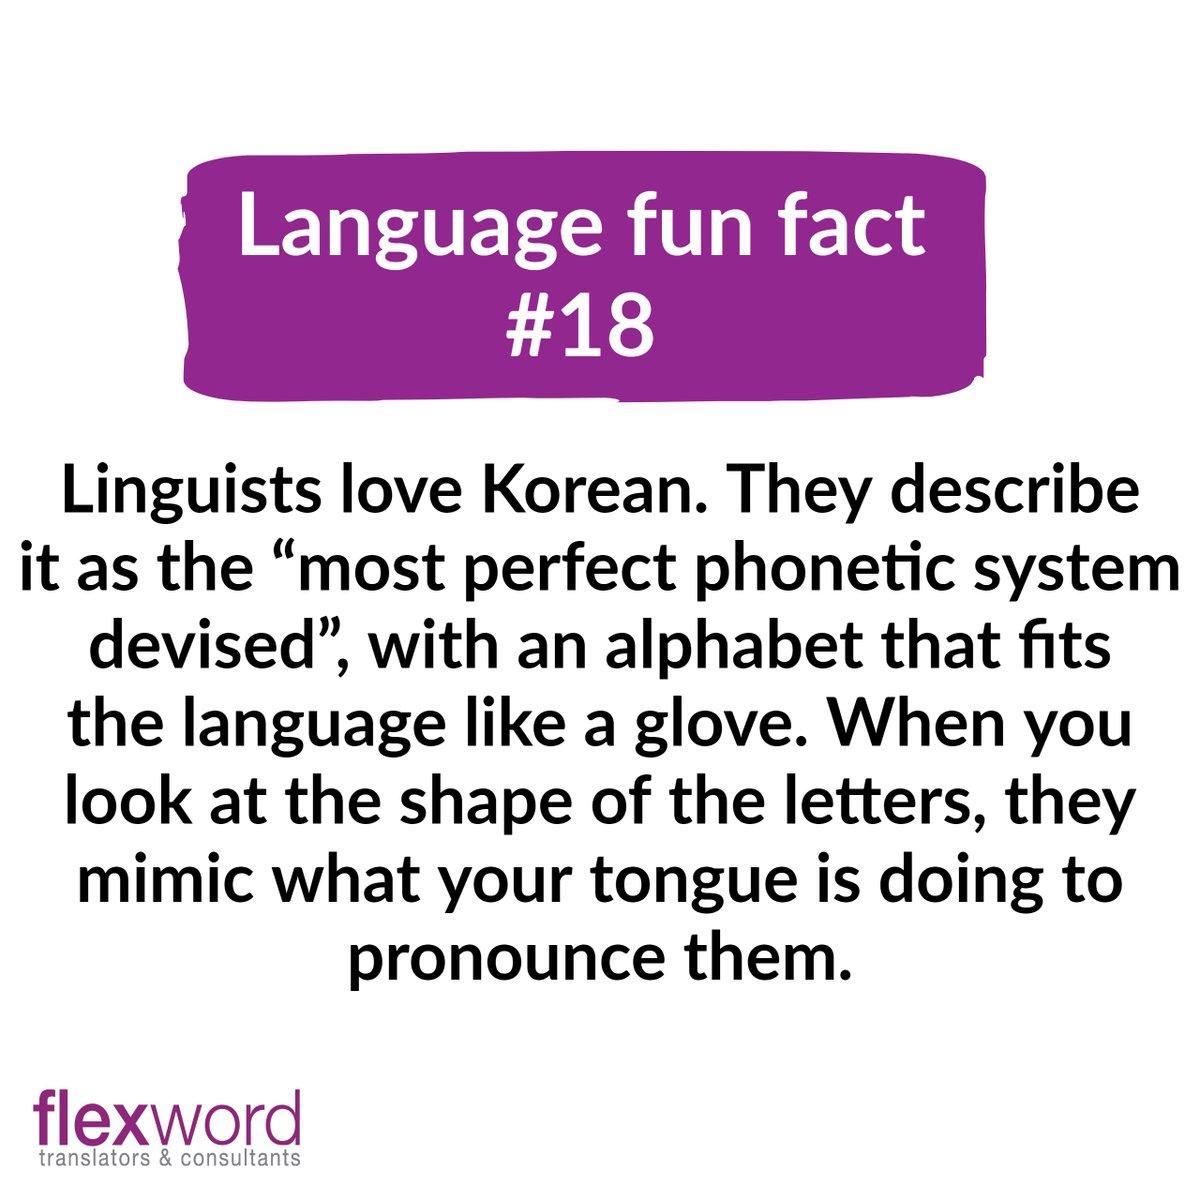 Fun language fact on this cold and gloomy Thursday! 🙂  #language #languagefact #words #korea #korean #koreanlanguage #translation #xl8 #t9n #translators #translatorslife #linguistics #translationagency #funfact #future #languagelearning #languagestudy #languagelover